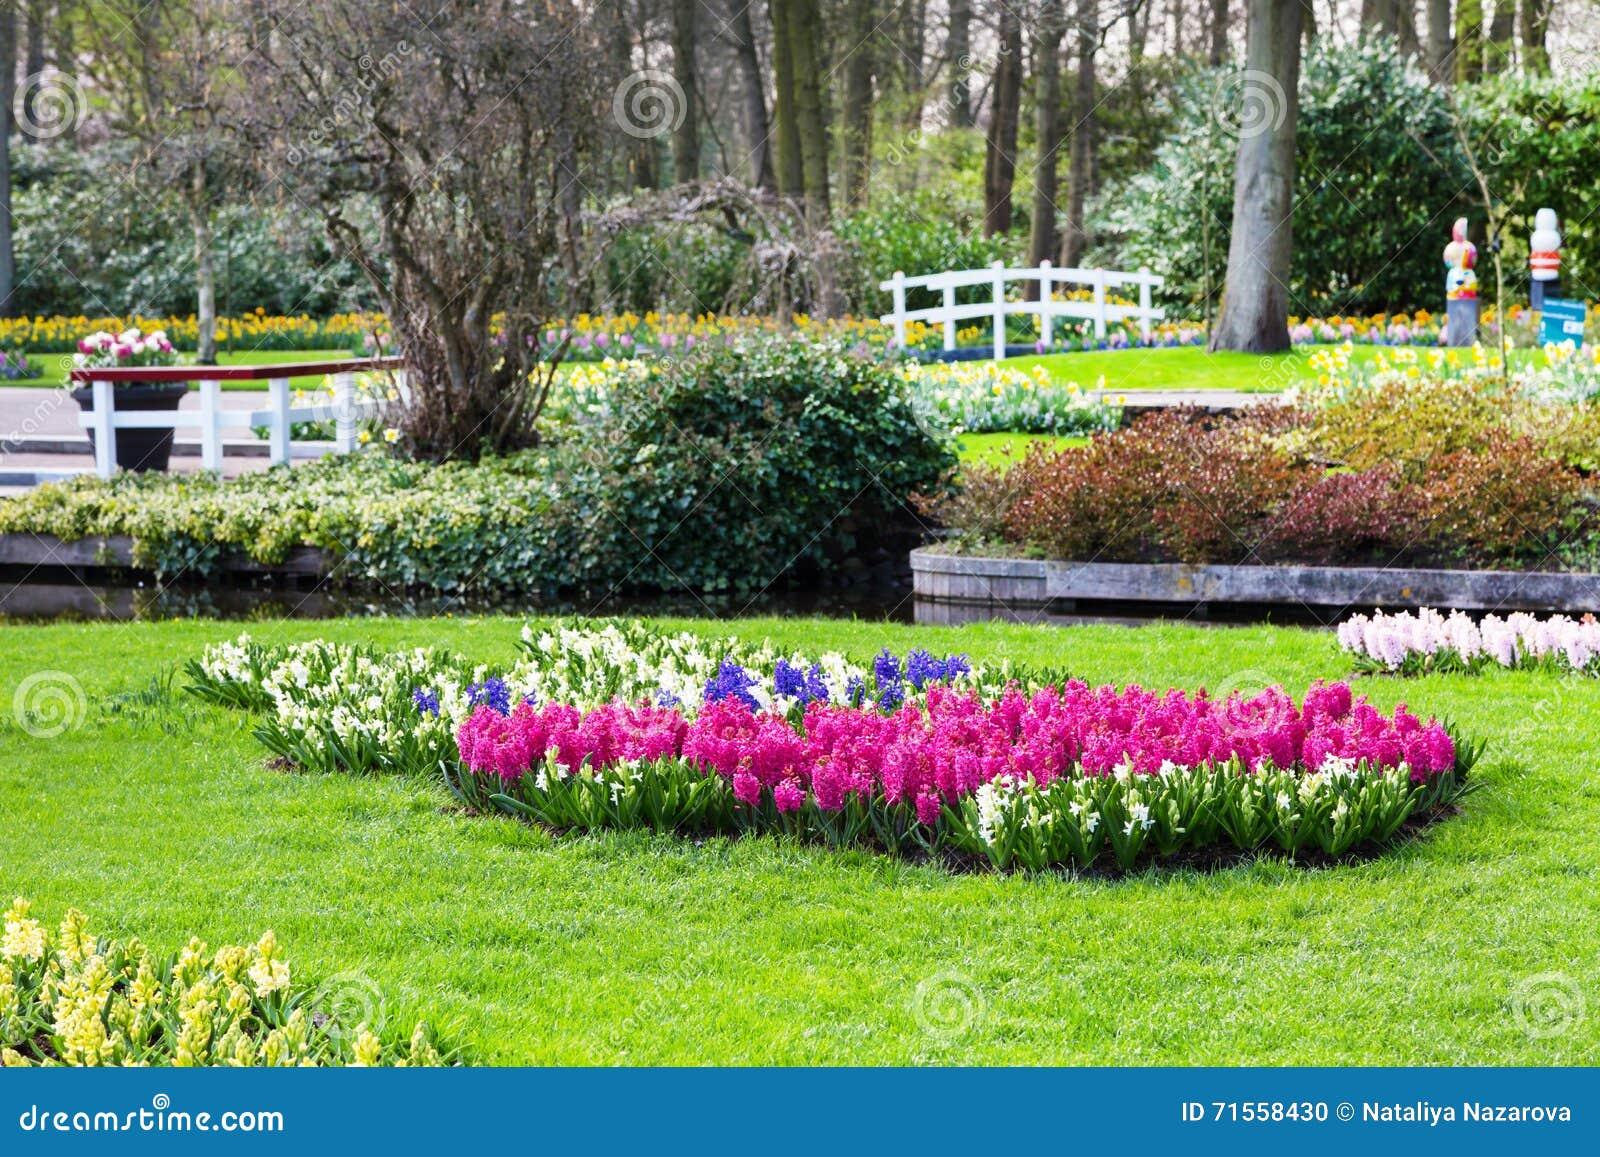 Fleurs hollande keukenhof for Le jardin keukenhof